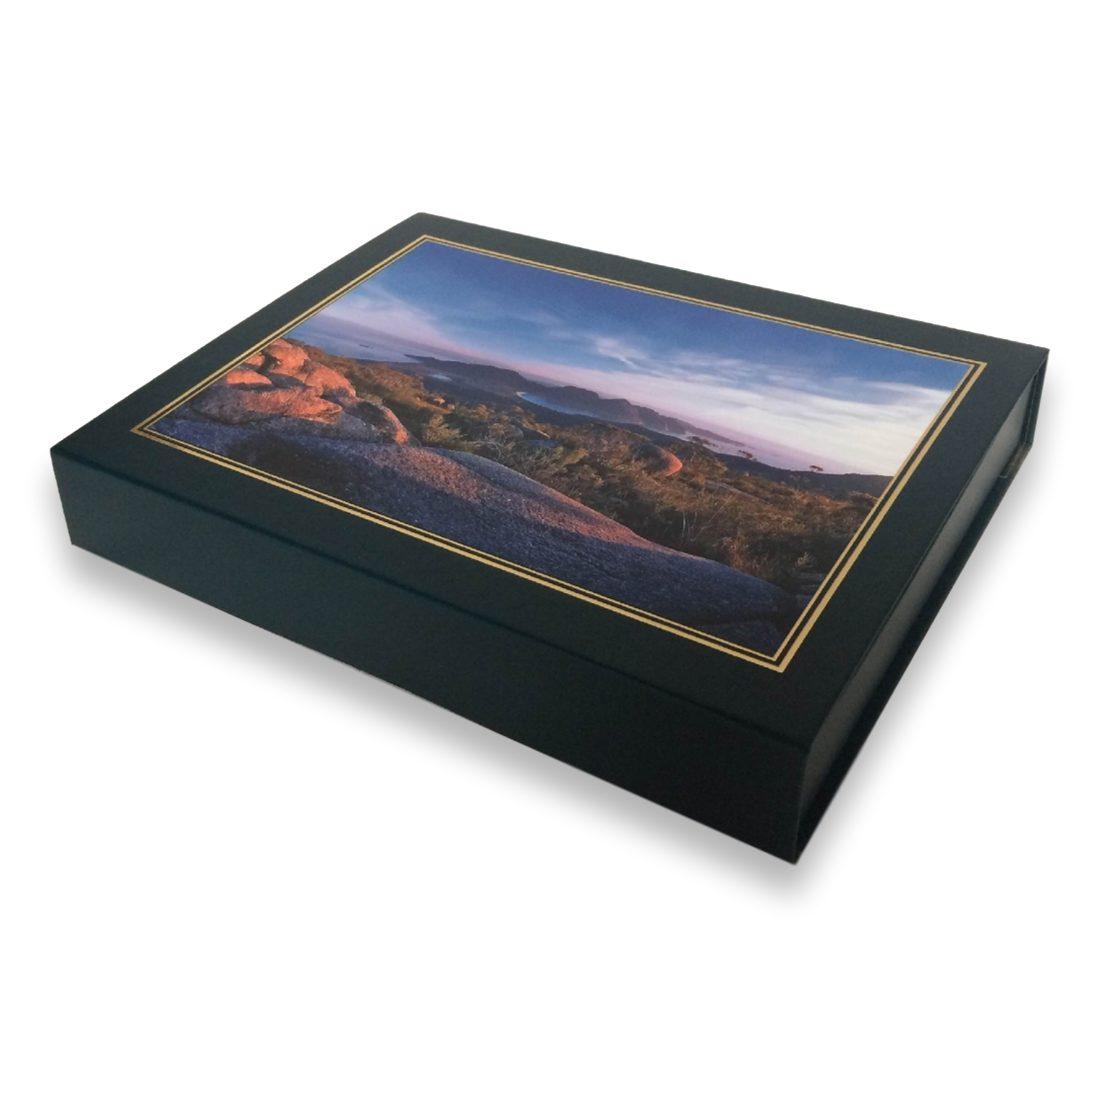 Luxury Gift Box Packaging